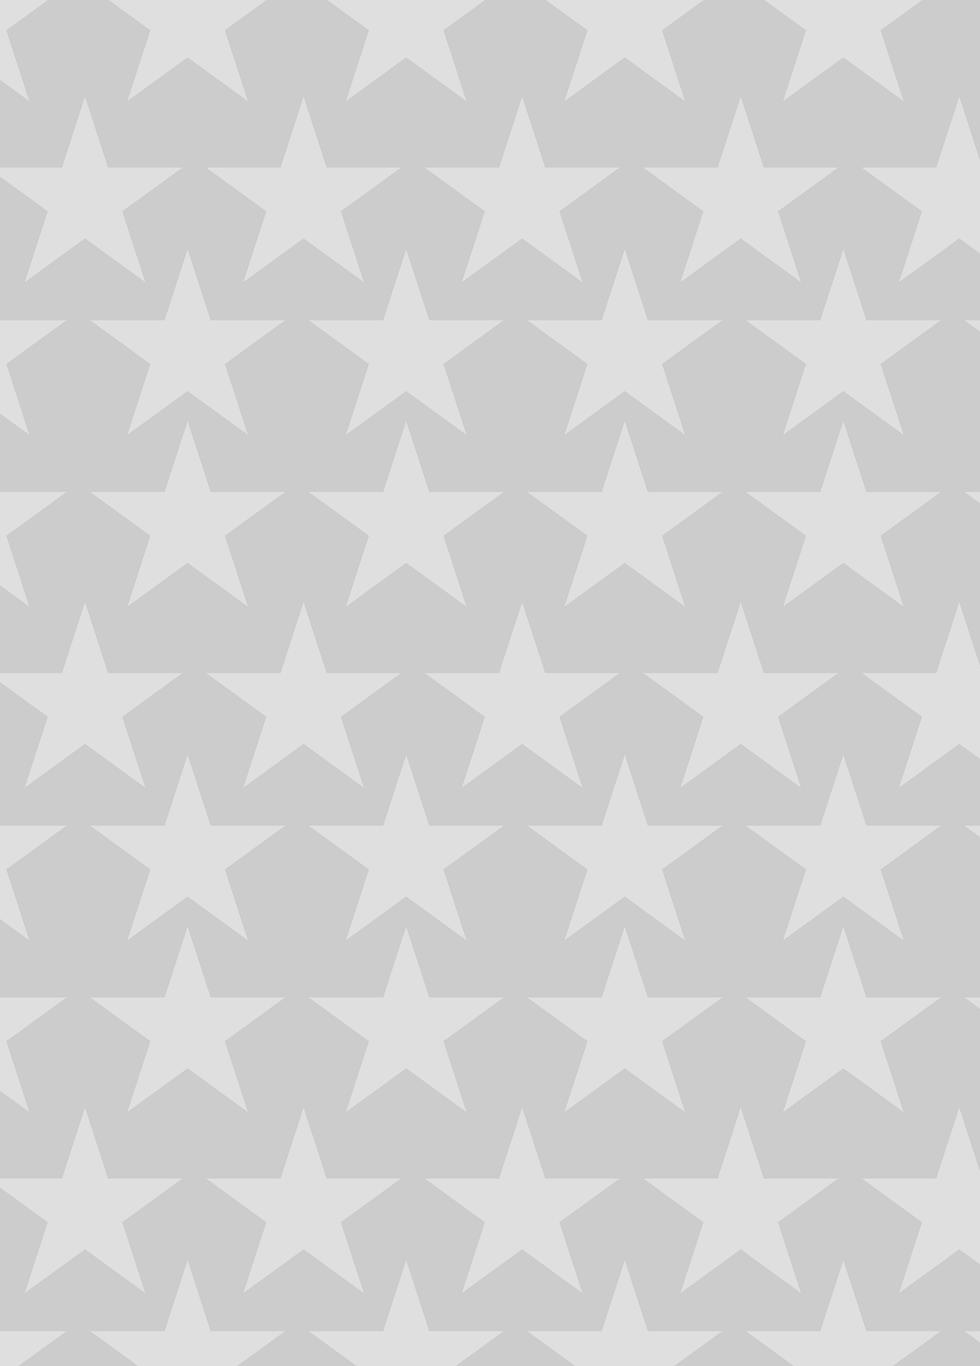 STARS_GREY.png